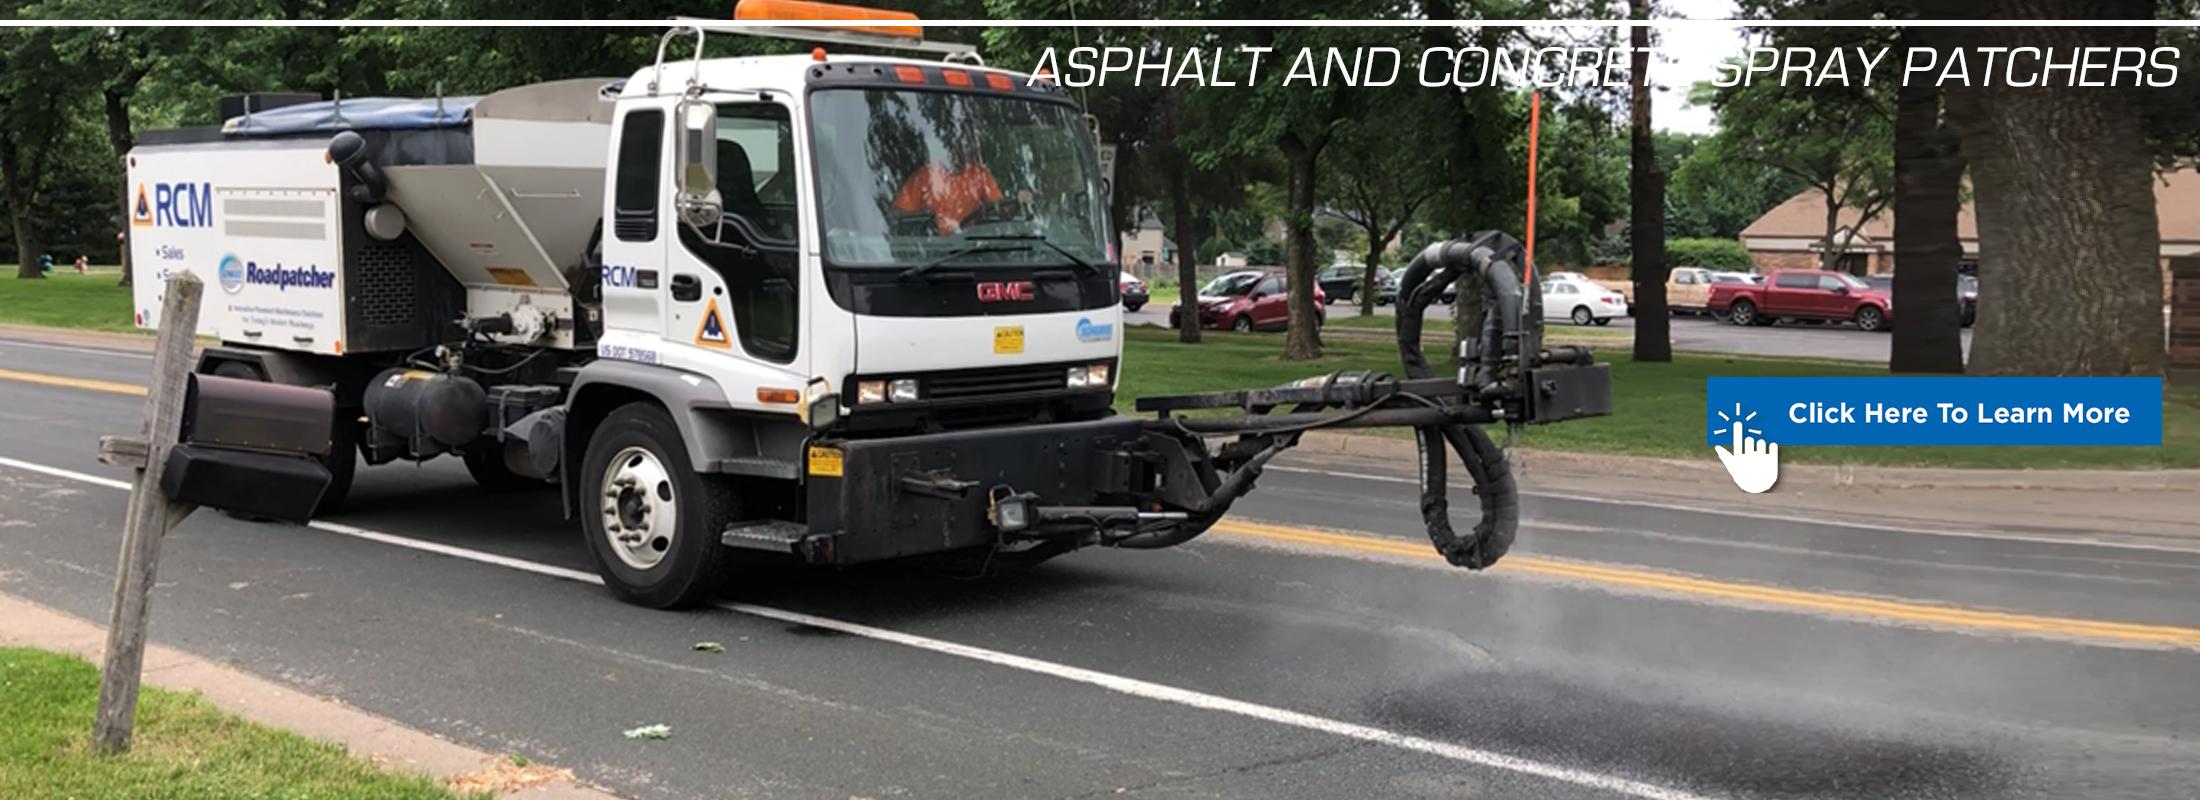 Aspahlt and concrete spray patcher banner graphic